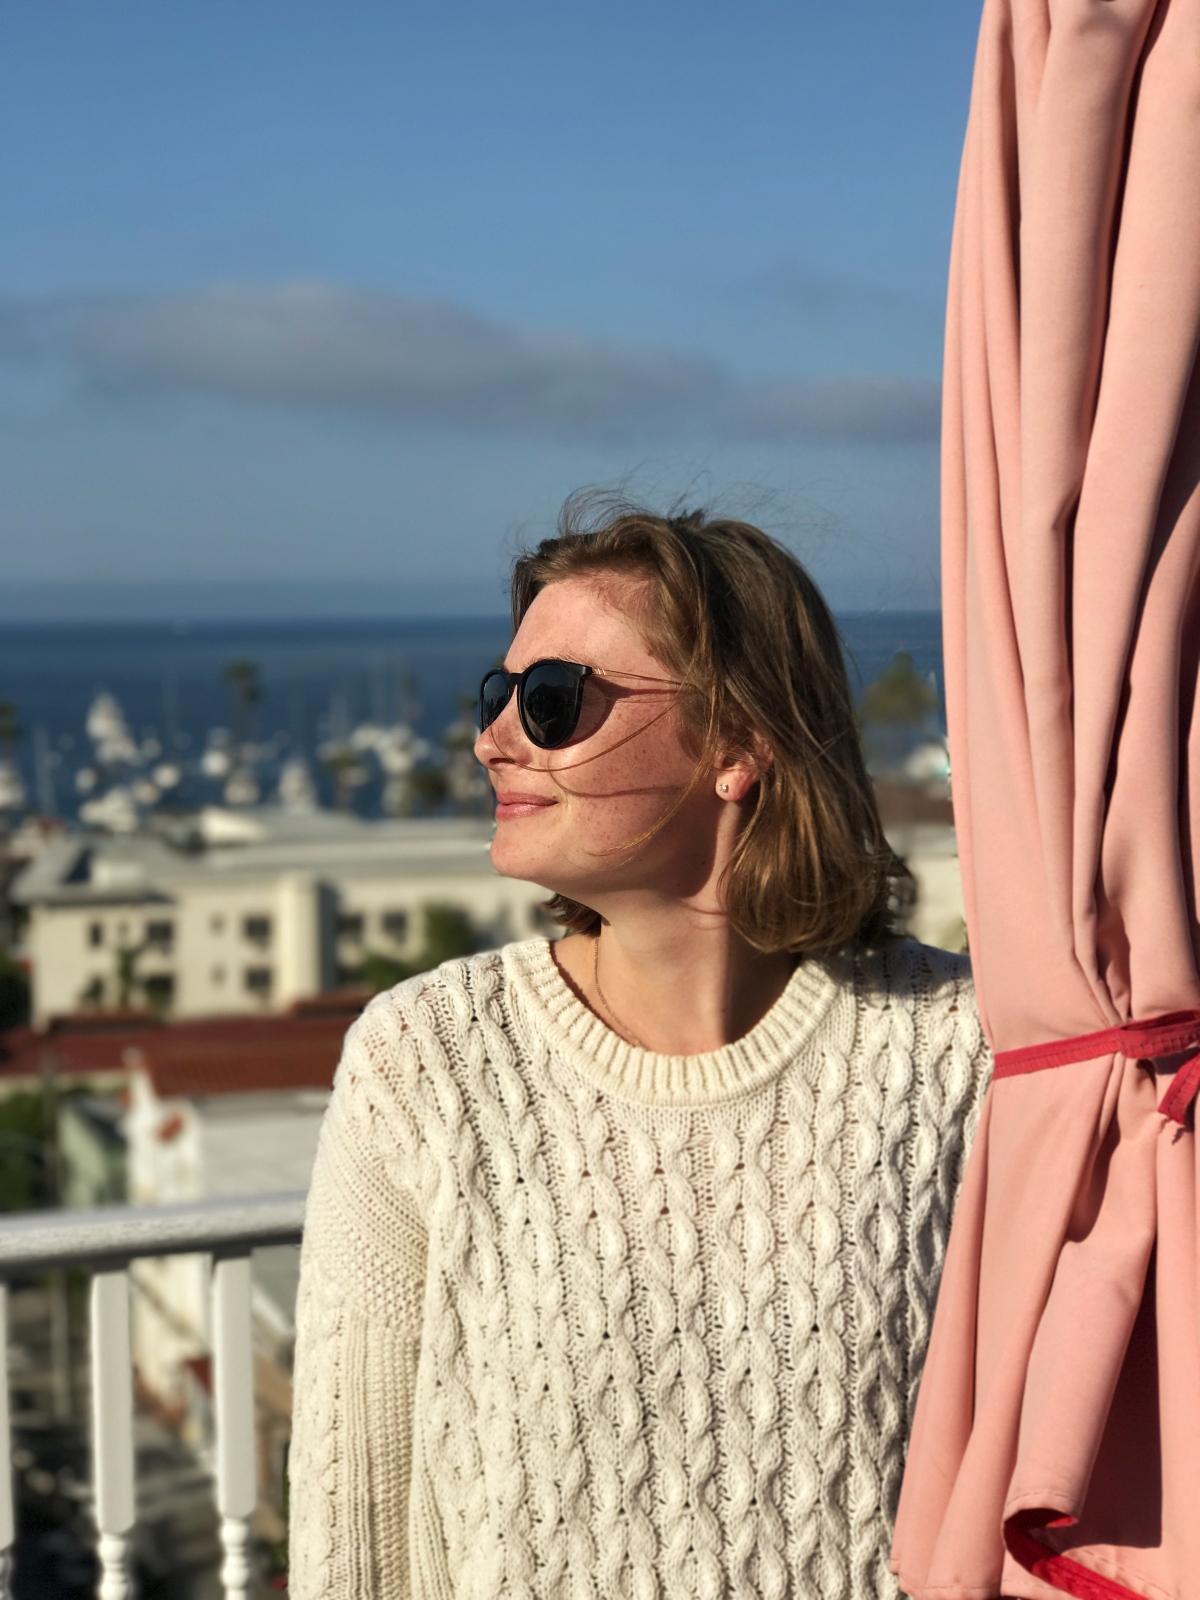 Lauren: Beauty Director, Clean Living Consultant, Founder of Detox MeTuesday